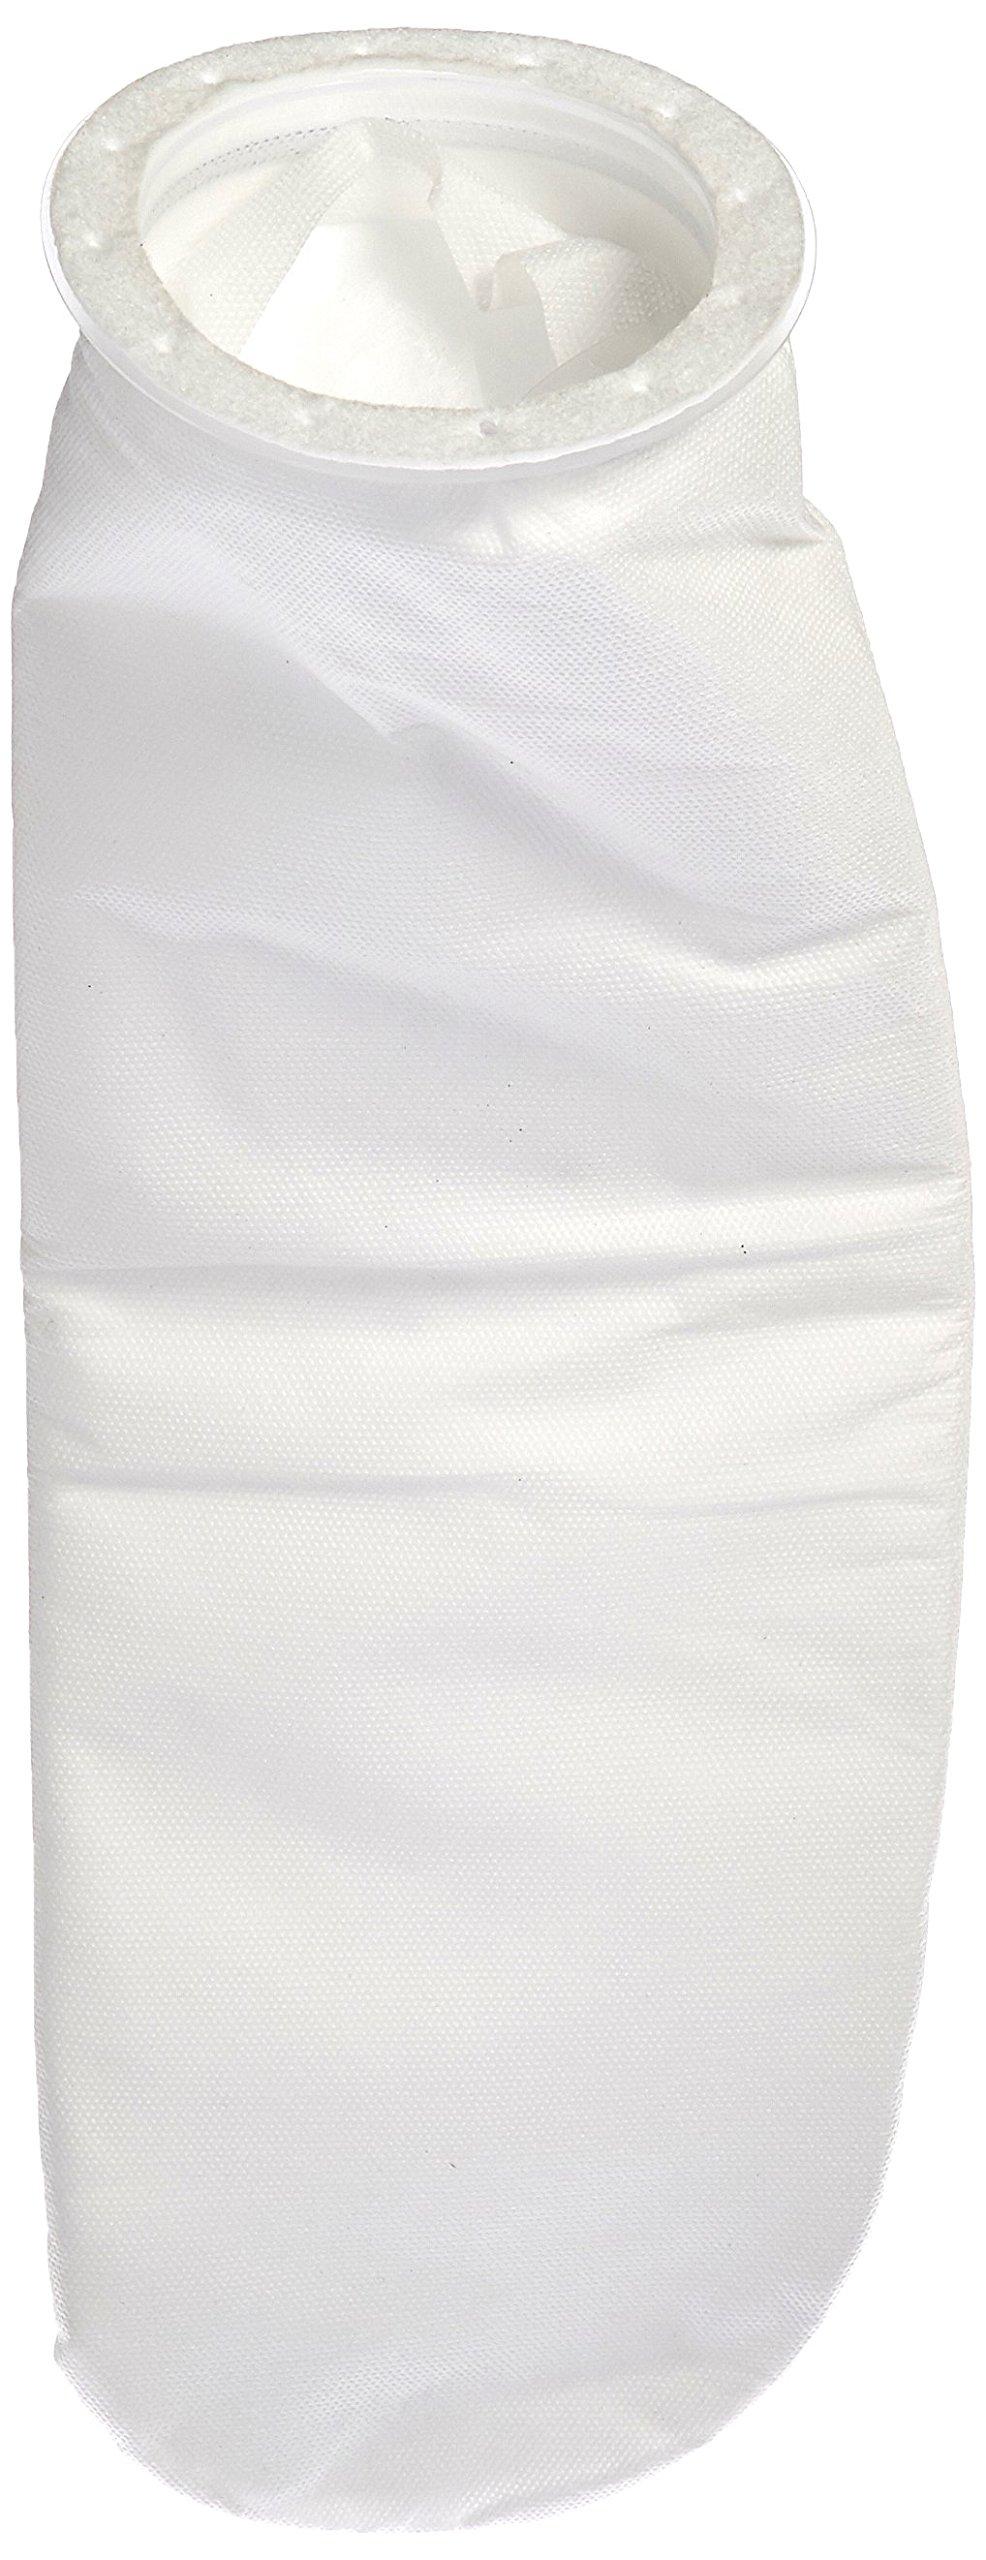 Pentek BPHE-420-25 High Efficiency Filter Bag